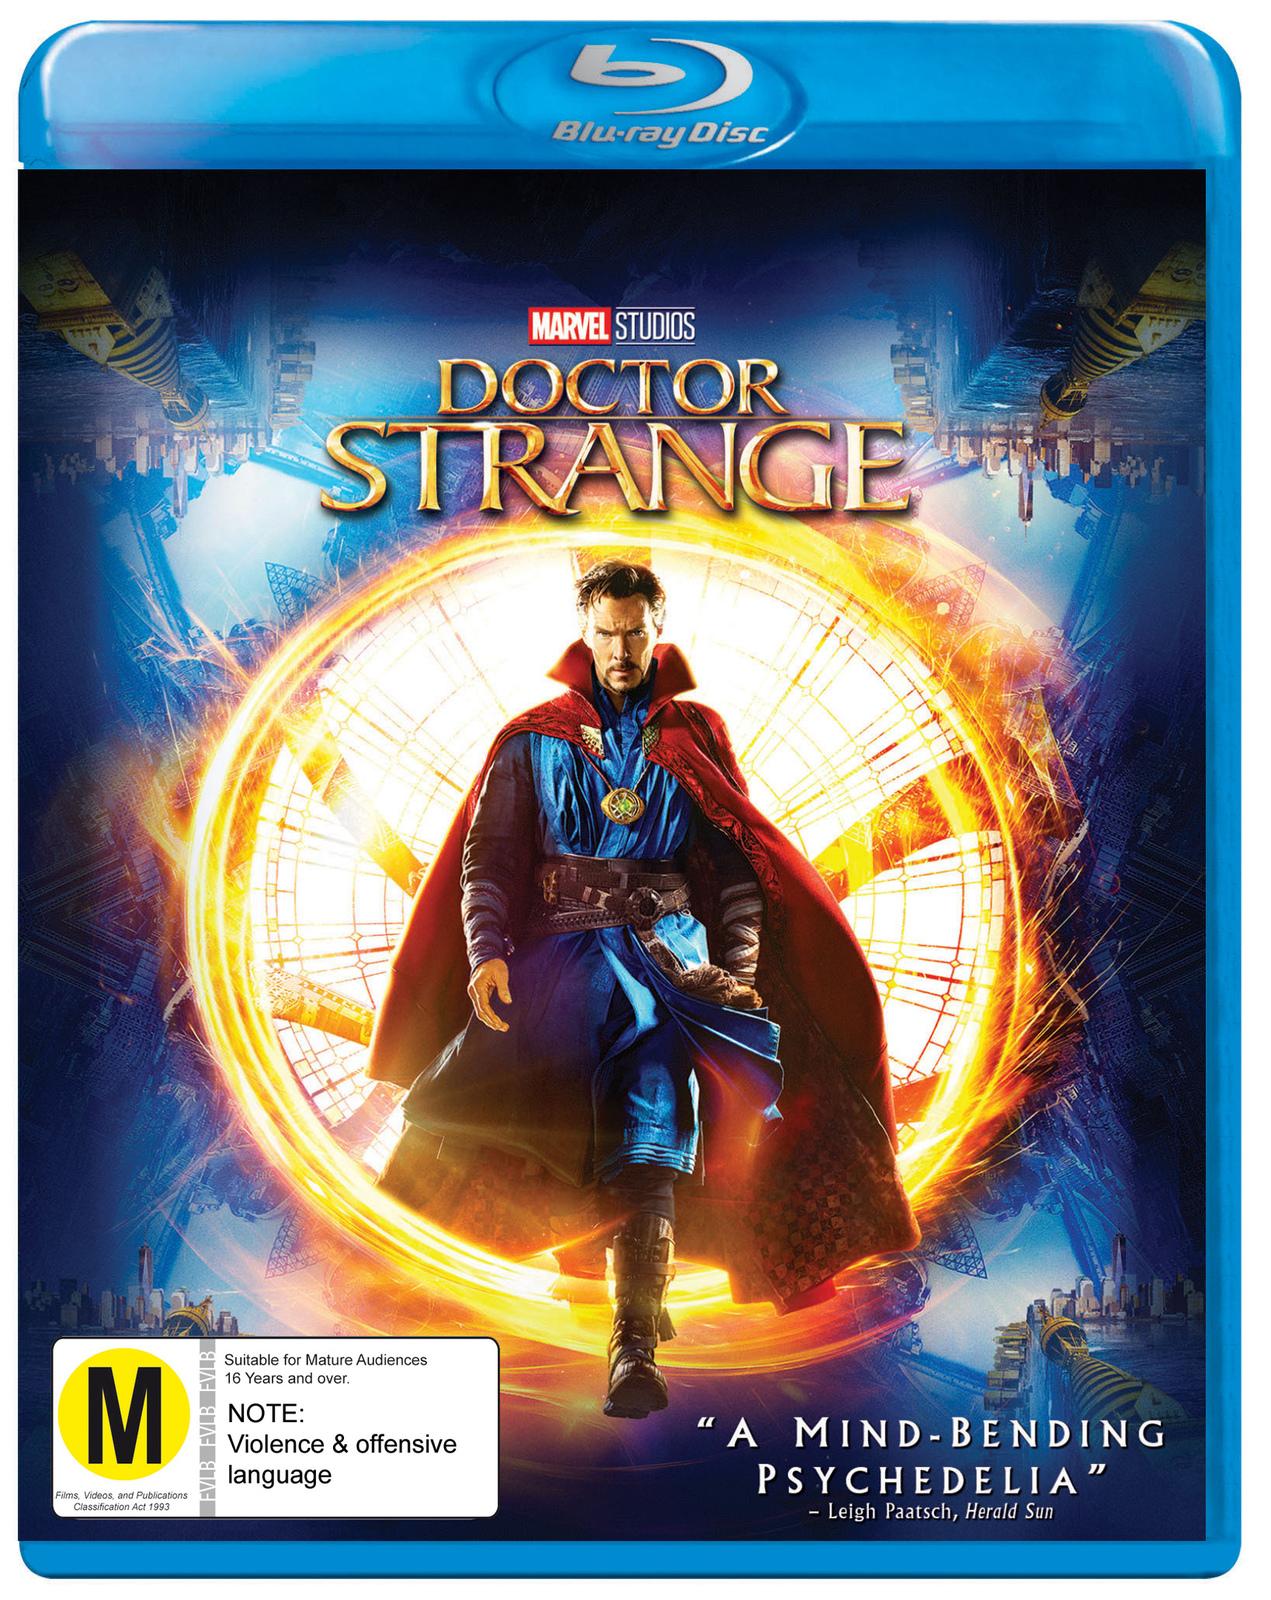 Doctor Strange on Blu-ray image